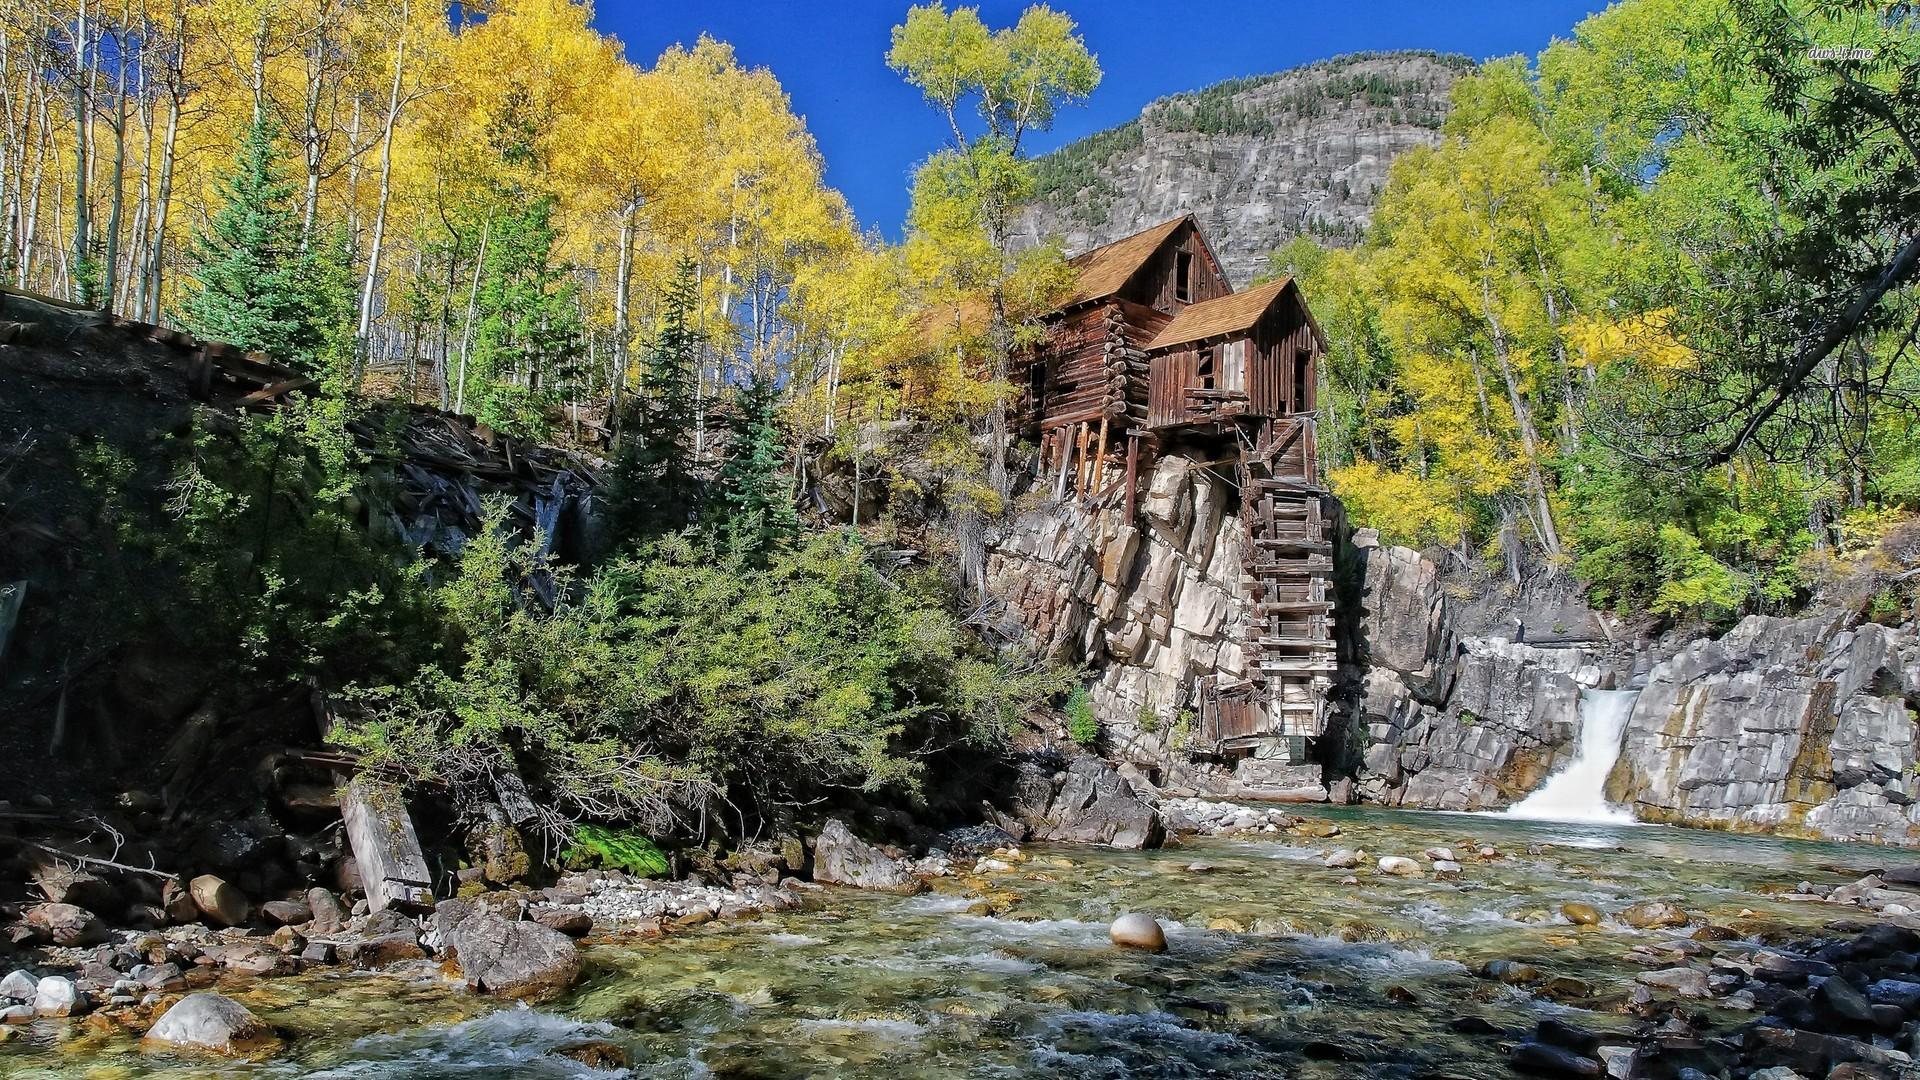 Riverside mountain cabin wallpaper   World wallpapers   16753 1920x1080